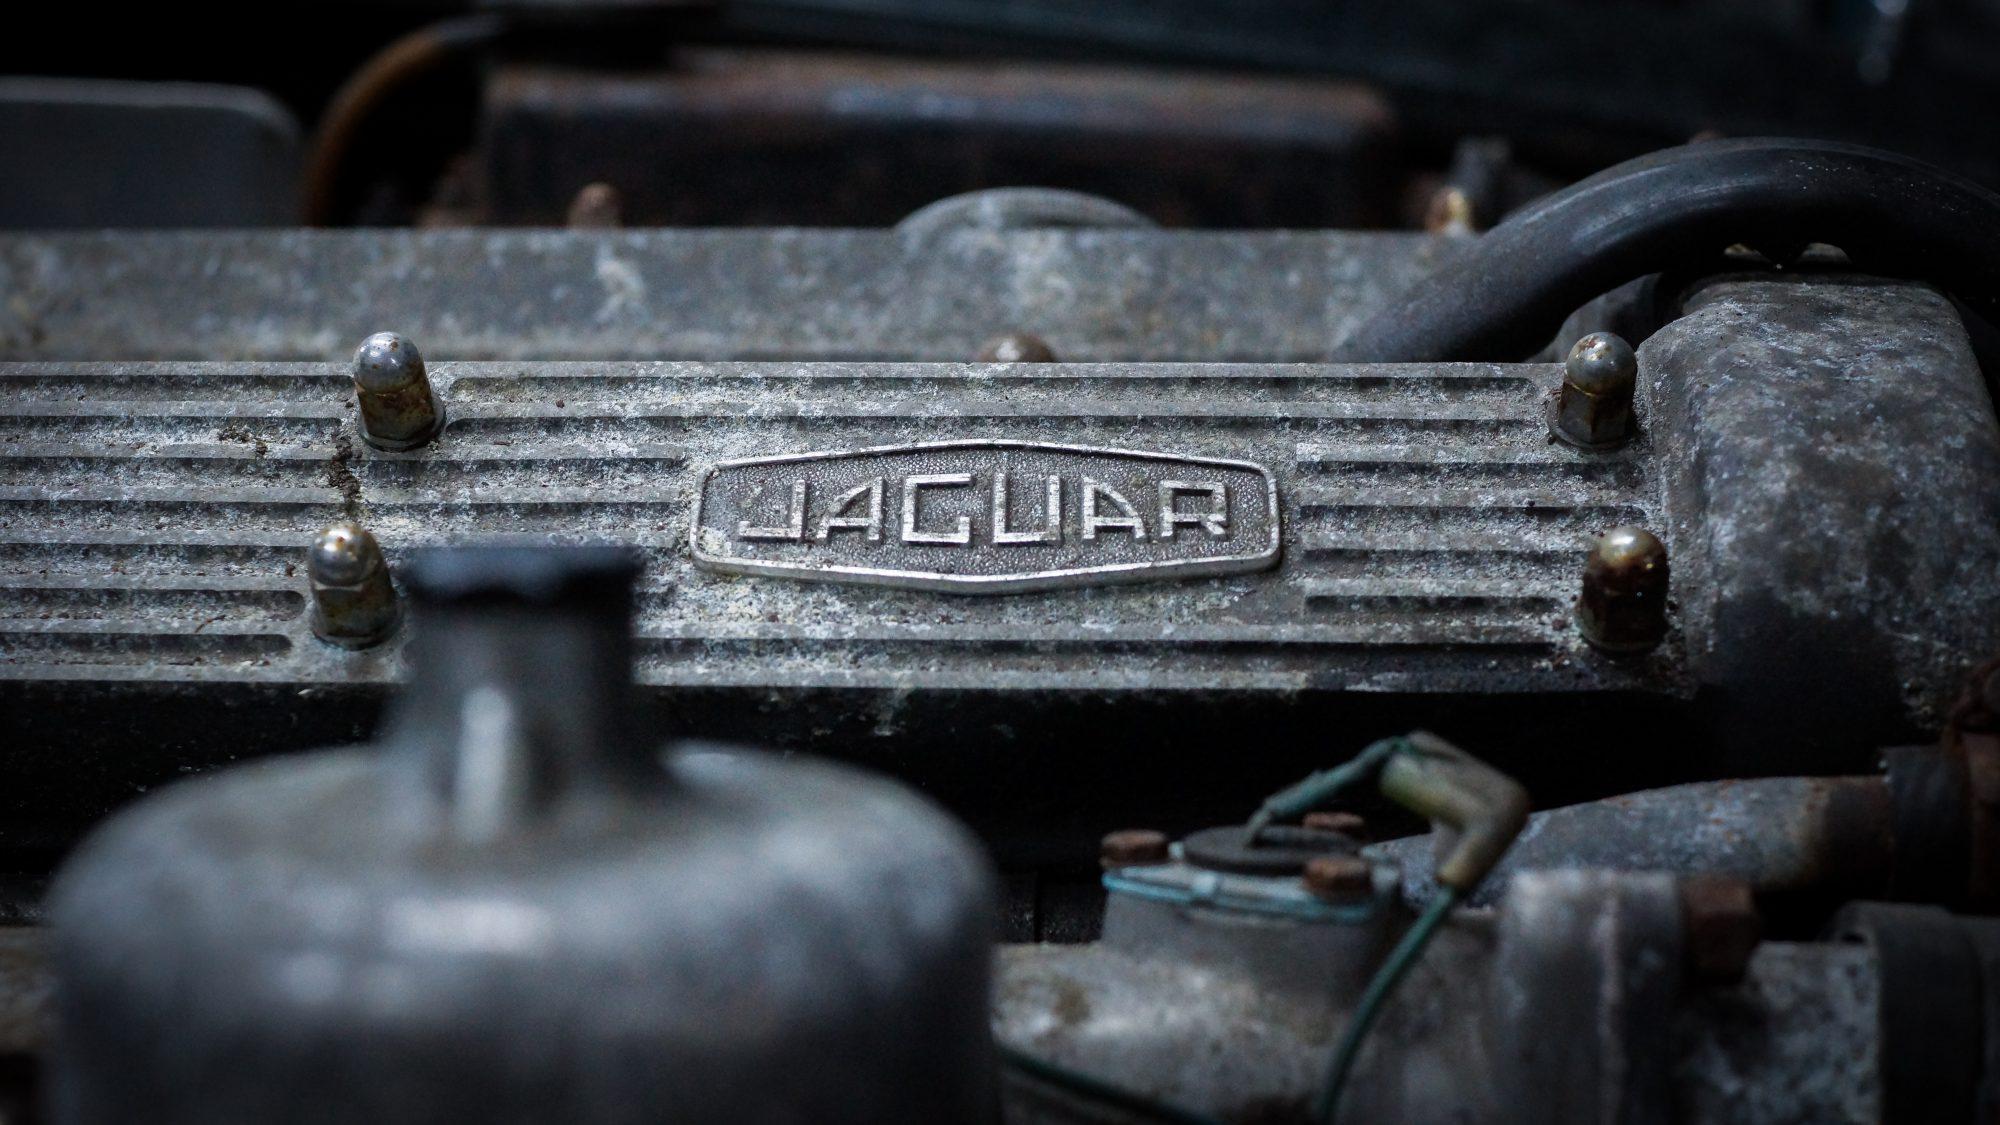 Jaguar, Jaguar 420G, 420G, The Krays, Ronnie and Reggie Kray, Jaguar engine